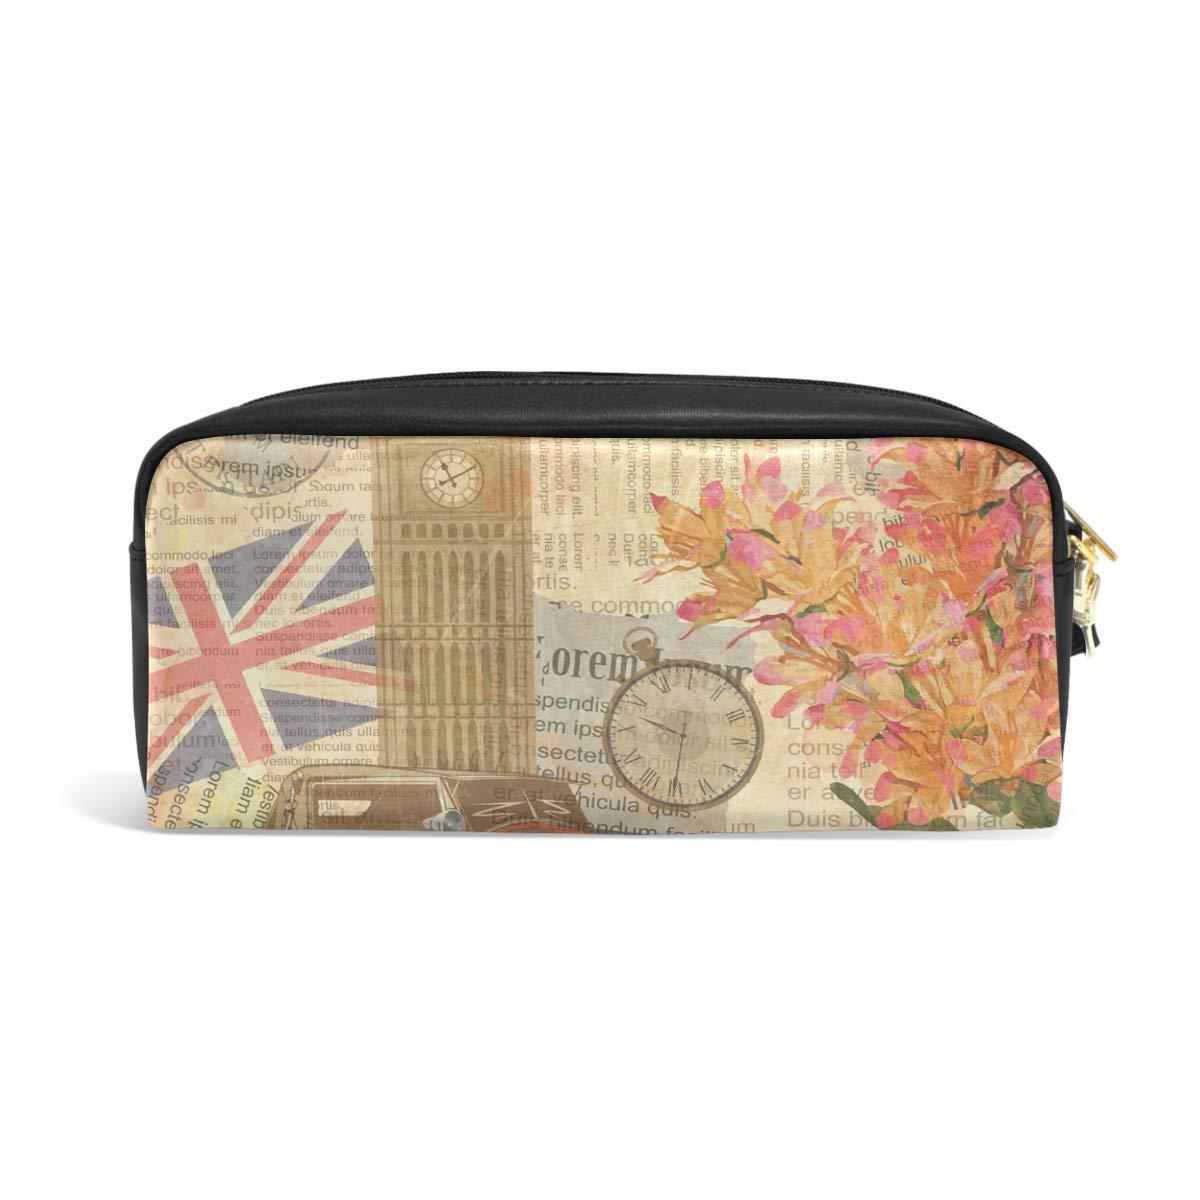 Bolso de papelería de pluma Vintage UK Flag Big Ben Car Maquillaje cosmético Bolsa Bolsa Monedero Cremallera Keepers Estuche de lápices para estudiante Niña Niño Niños: Amazon.es: Hogar